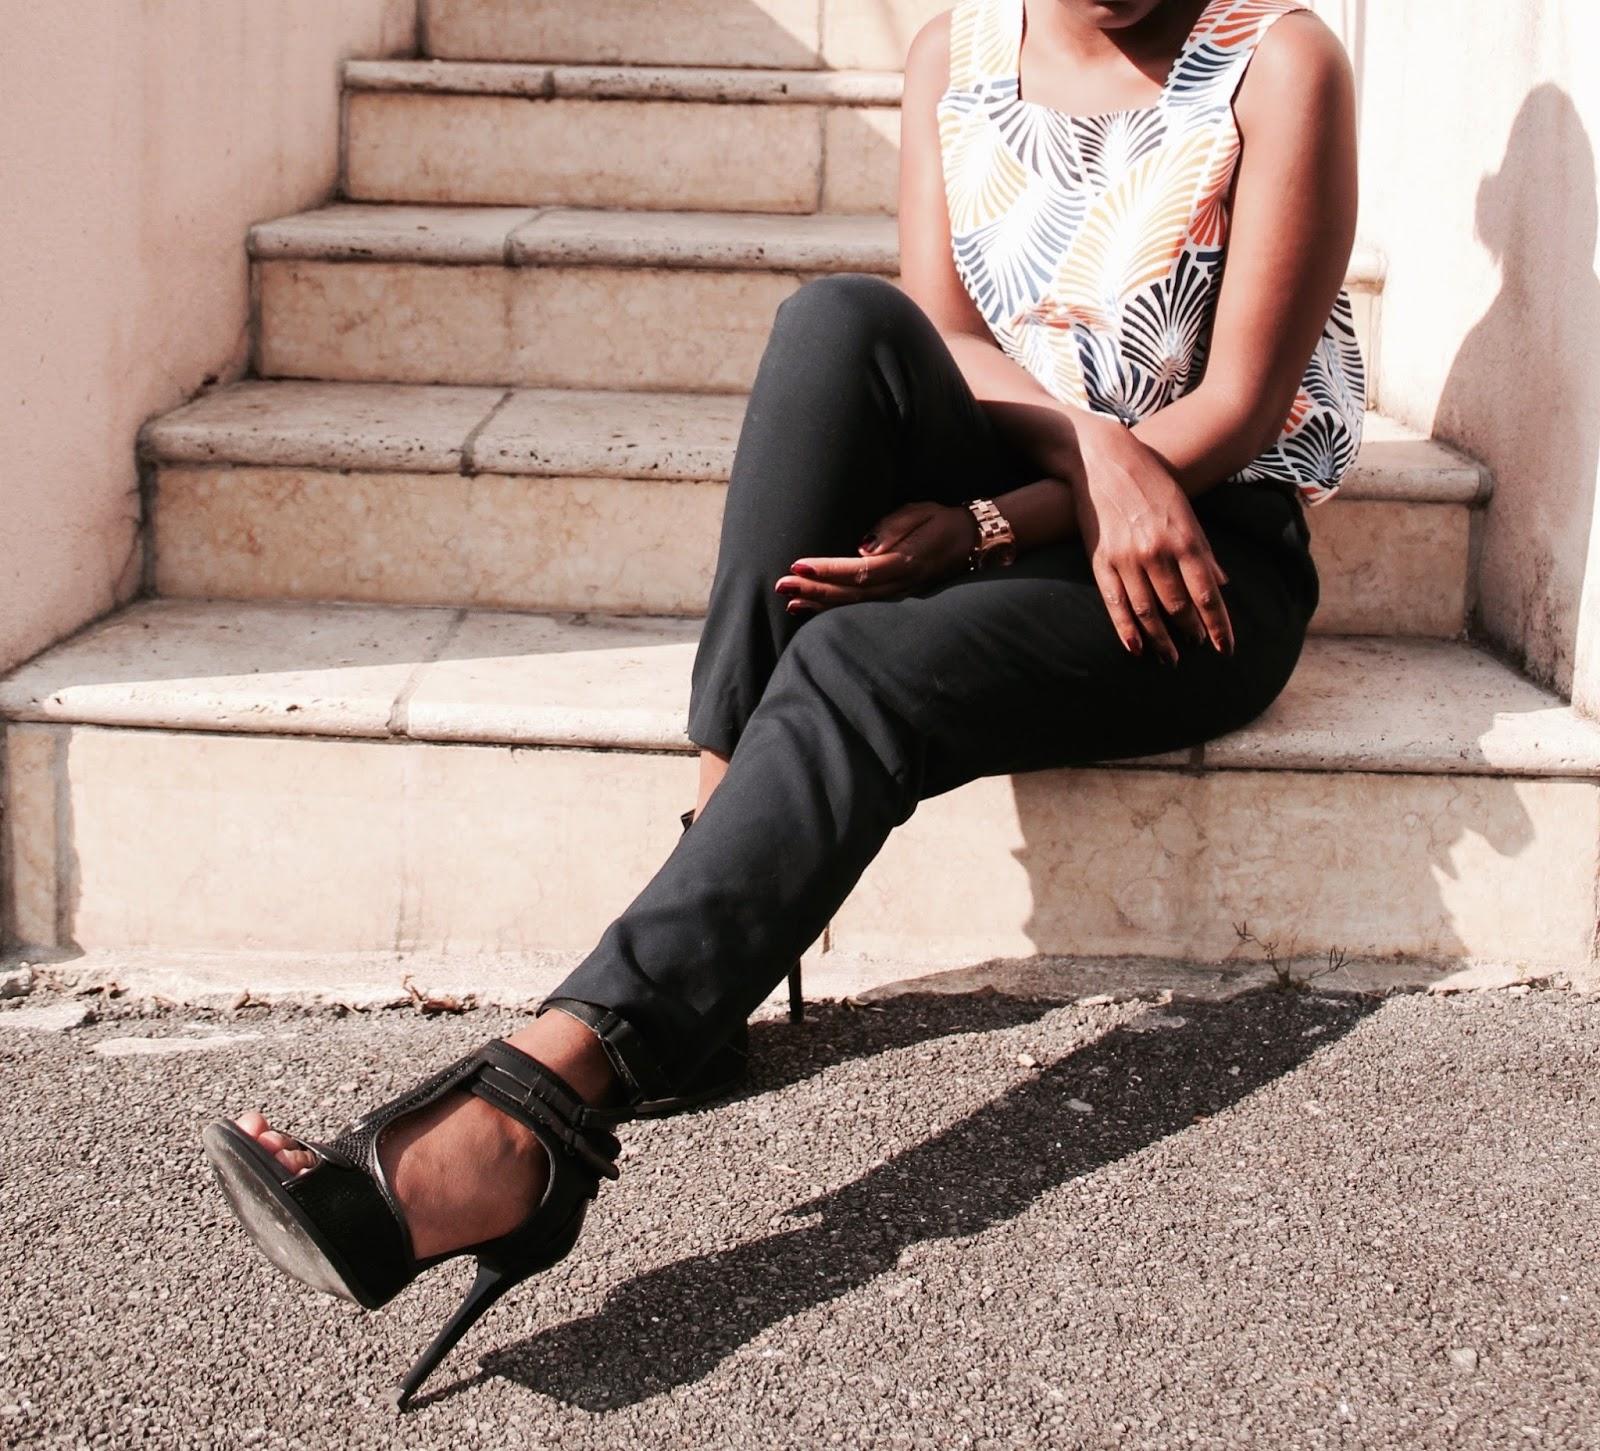 tenuechic-chaussurezara-topzara-tendance-chic-petitsbudgets-monuniforme-hype-tendance-fashionblogger-blogmode